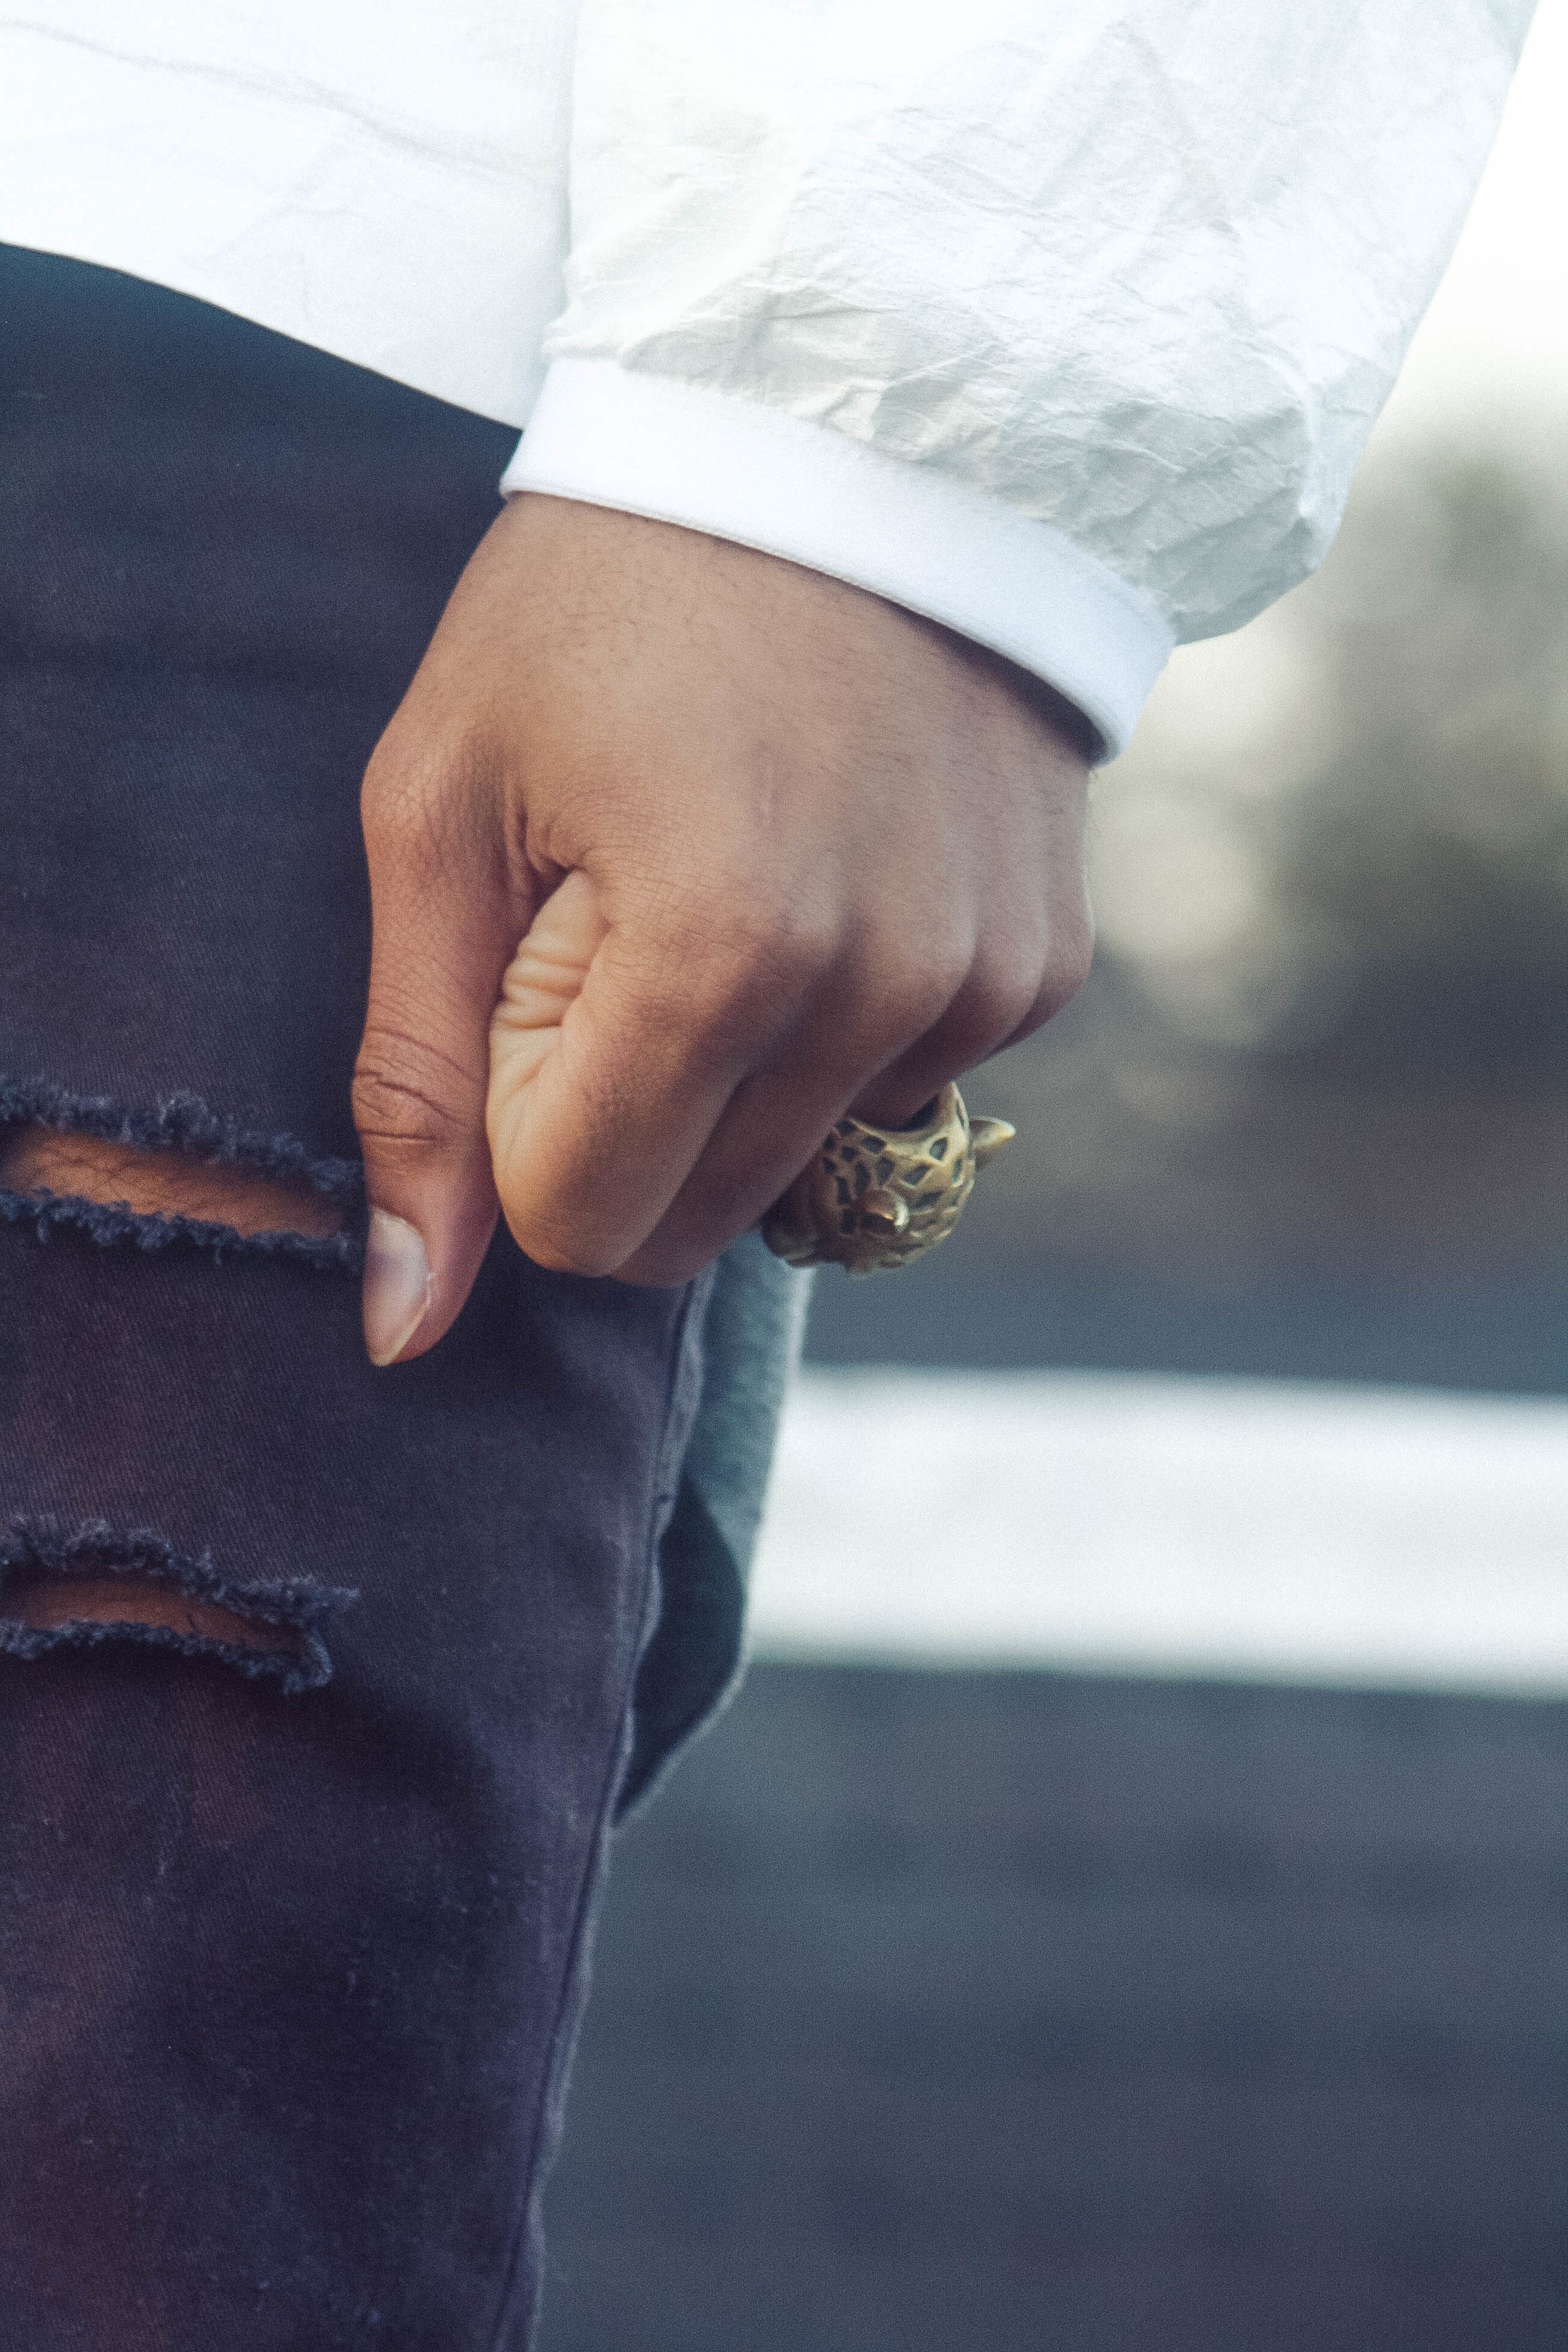 Elev8ed photoshoot with model/fashion-blogger, Sir Johnson, for Yeezy S1 invitational jacket